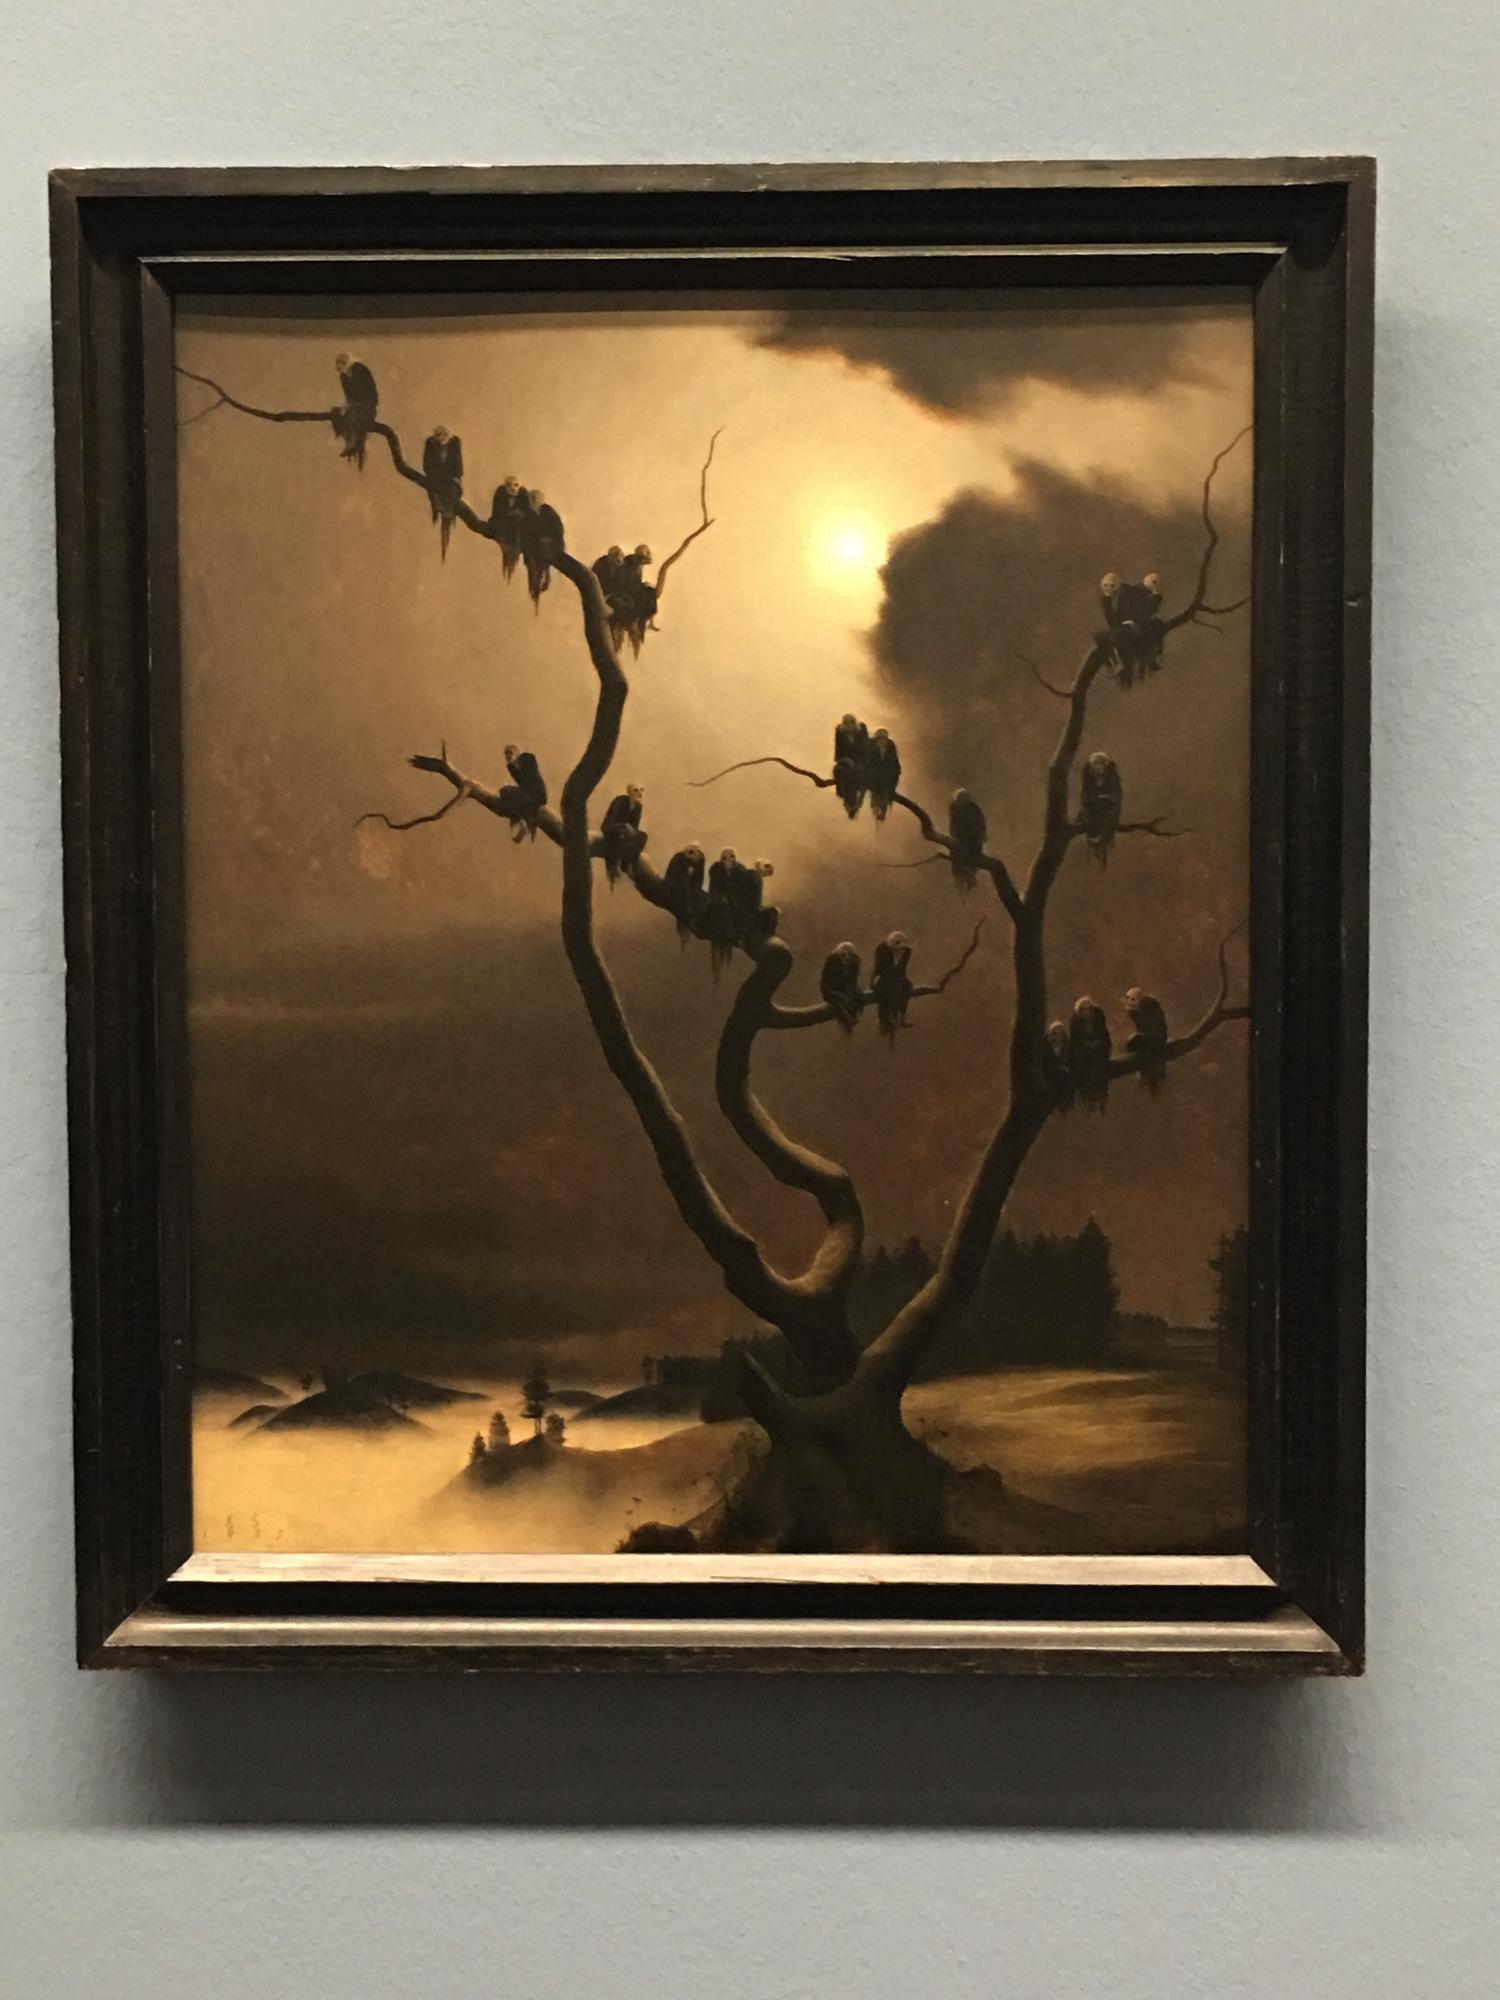 Franz Sedlacek, Ghosts in the Tree, 1933, Albertina Museum, Vienna